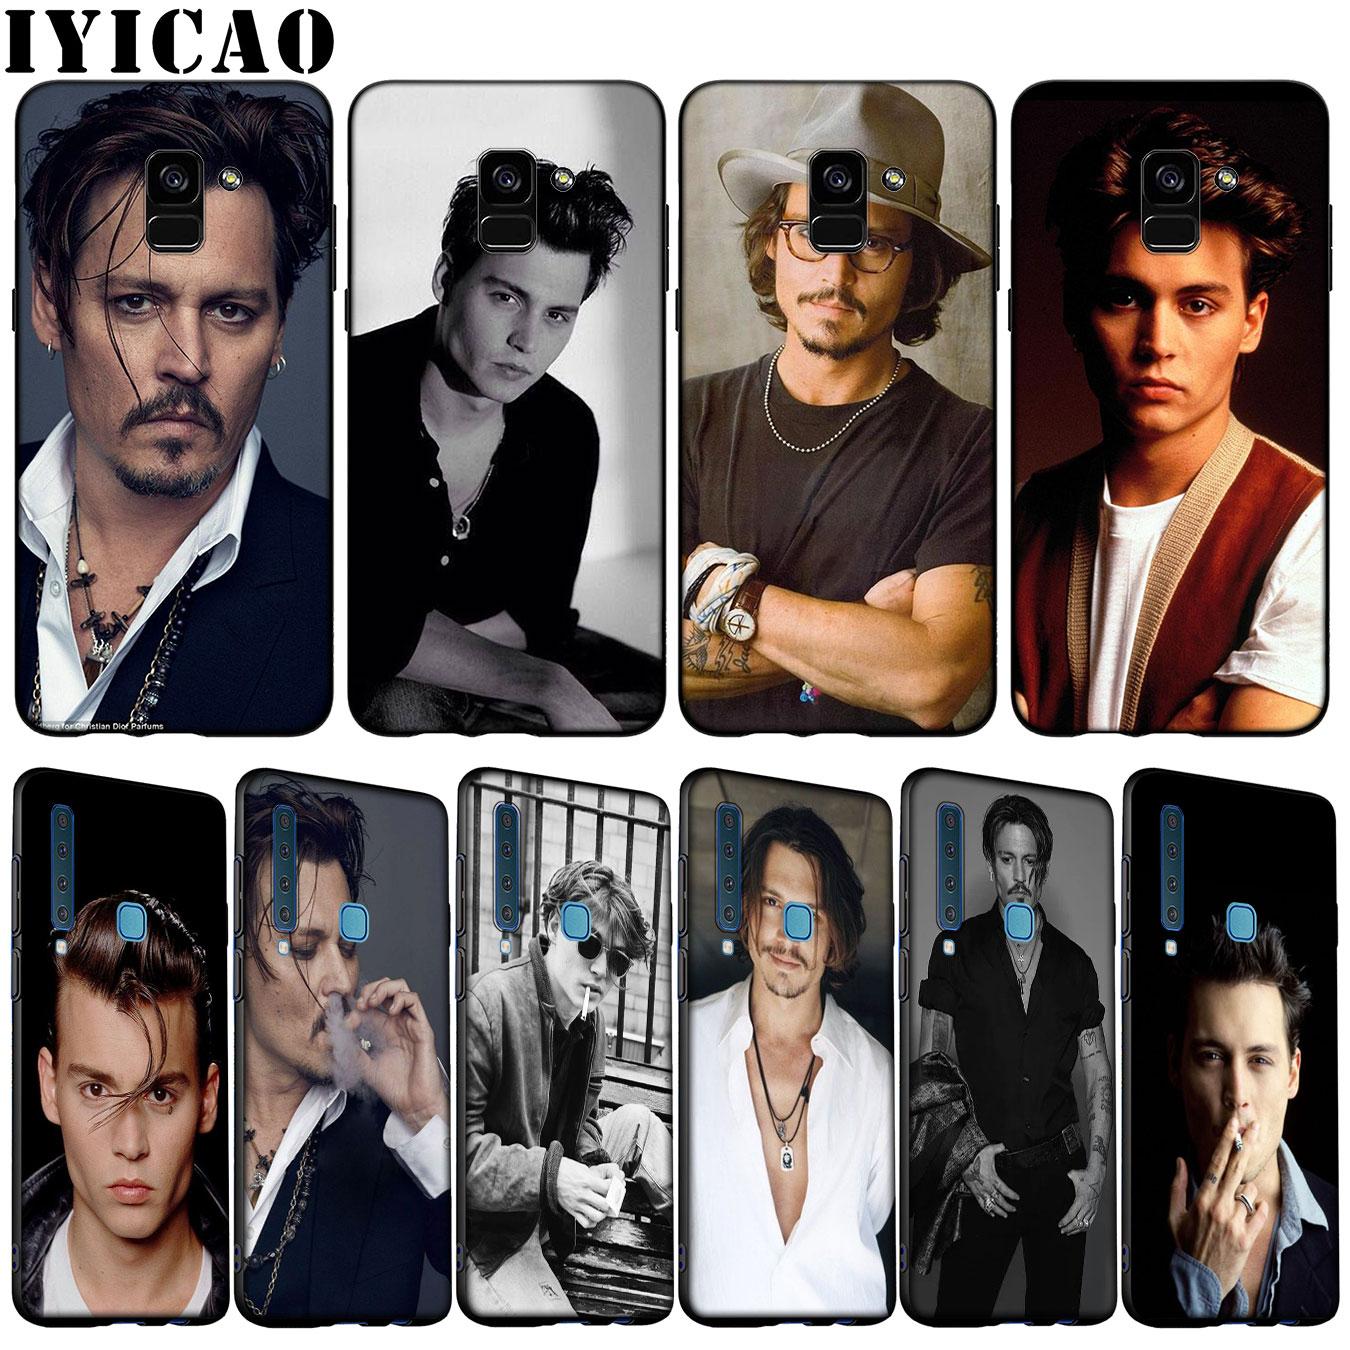 IYICAO johnny depp Caso de Telefone de Silicone Macio para Samsung Galaxy A6 A7 A8 A9 2018 A3 A5 2016 2017 Nota 9 8 10 Plus